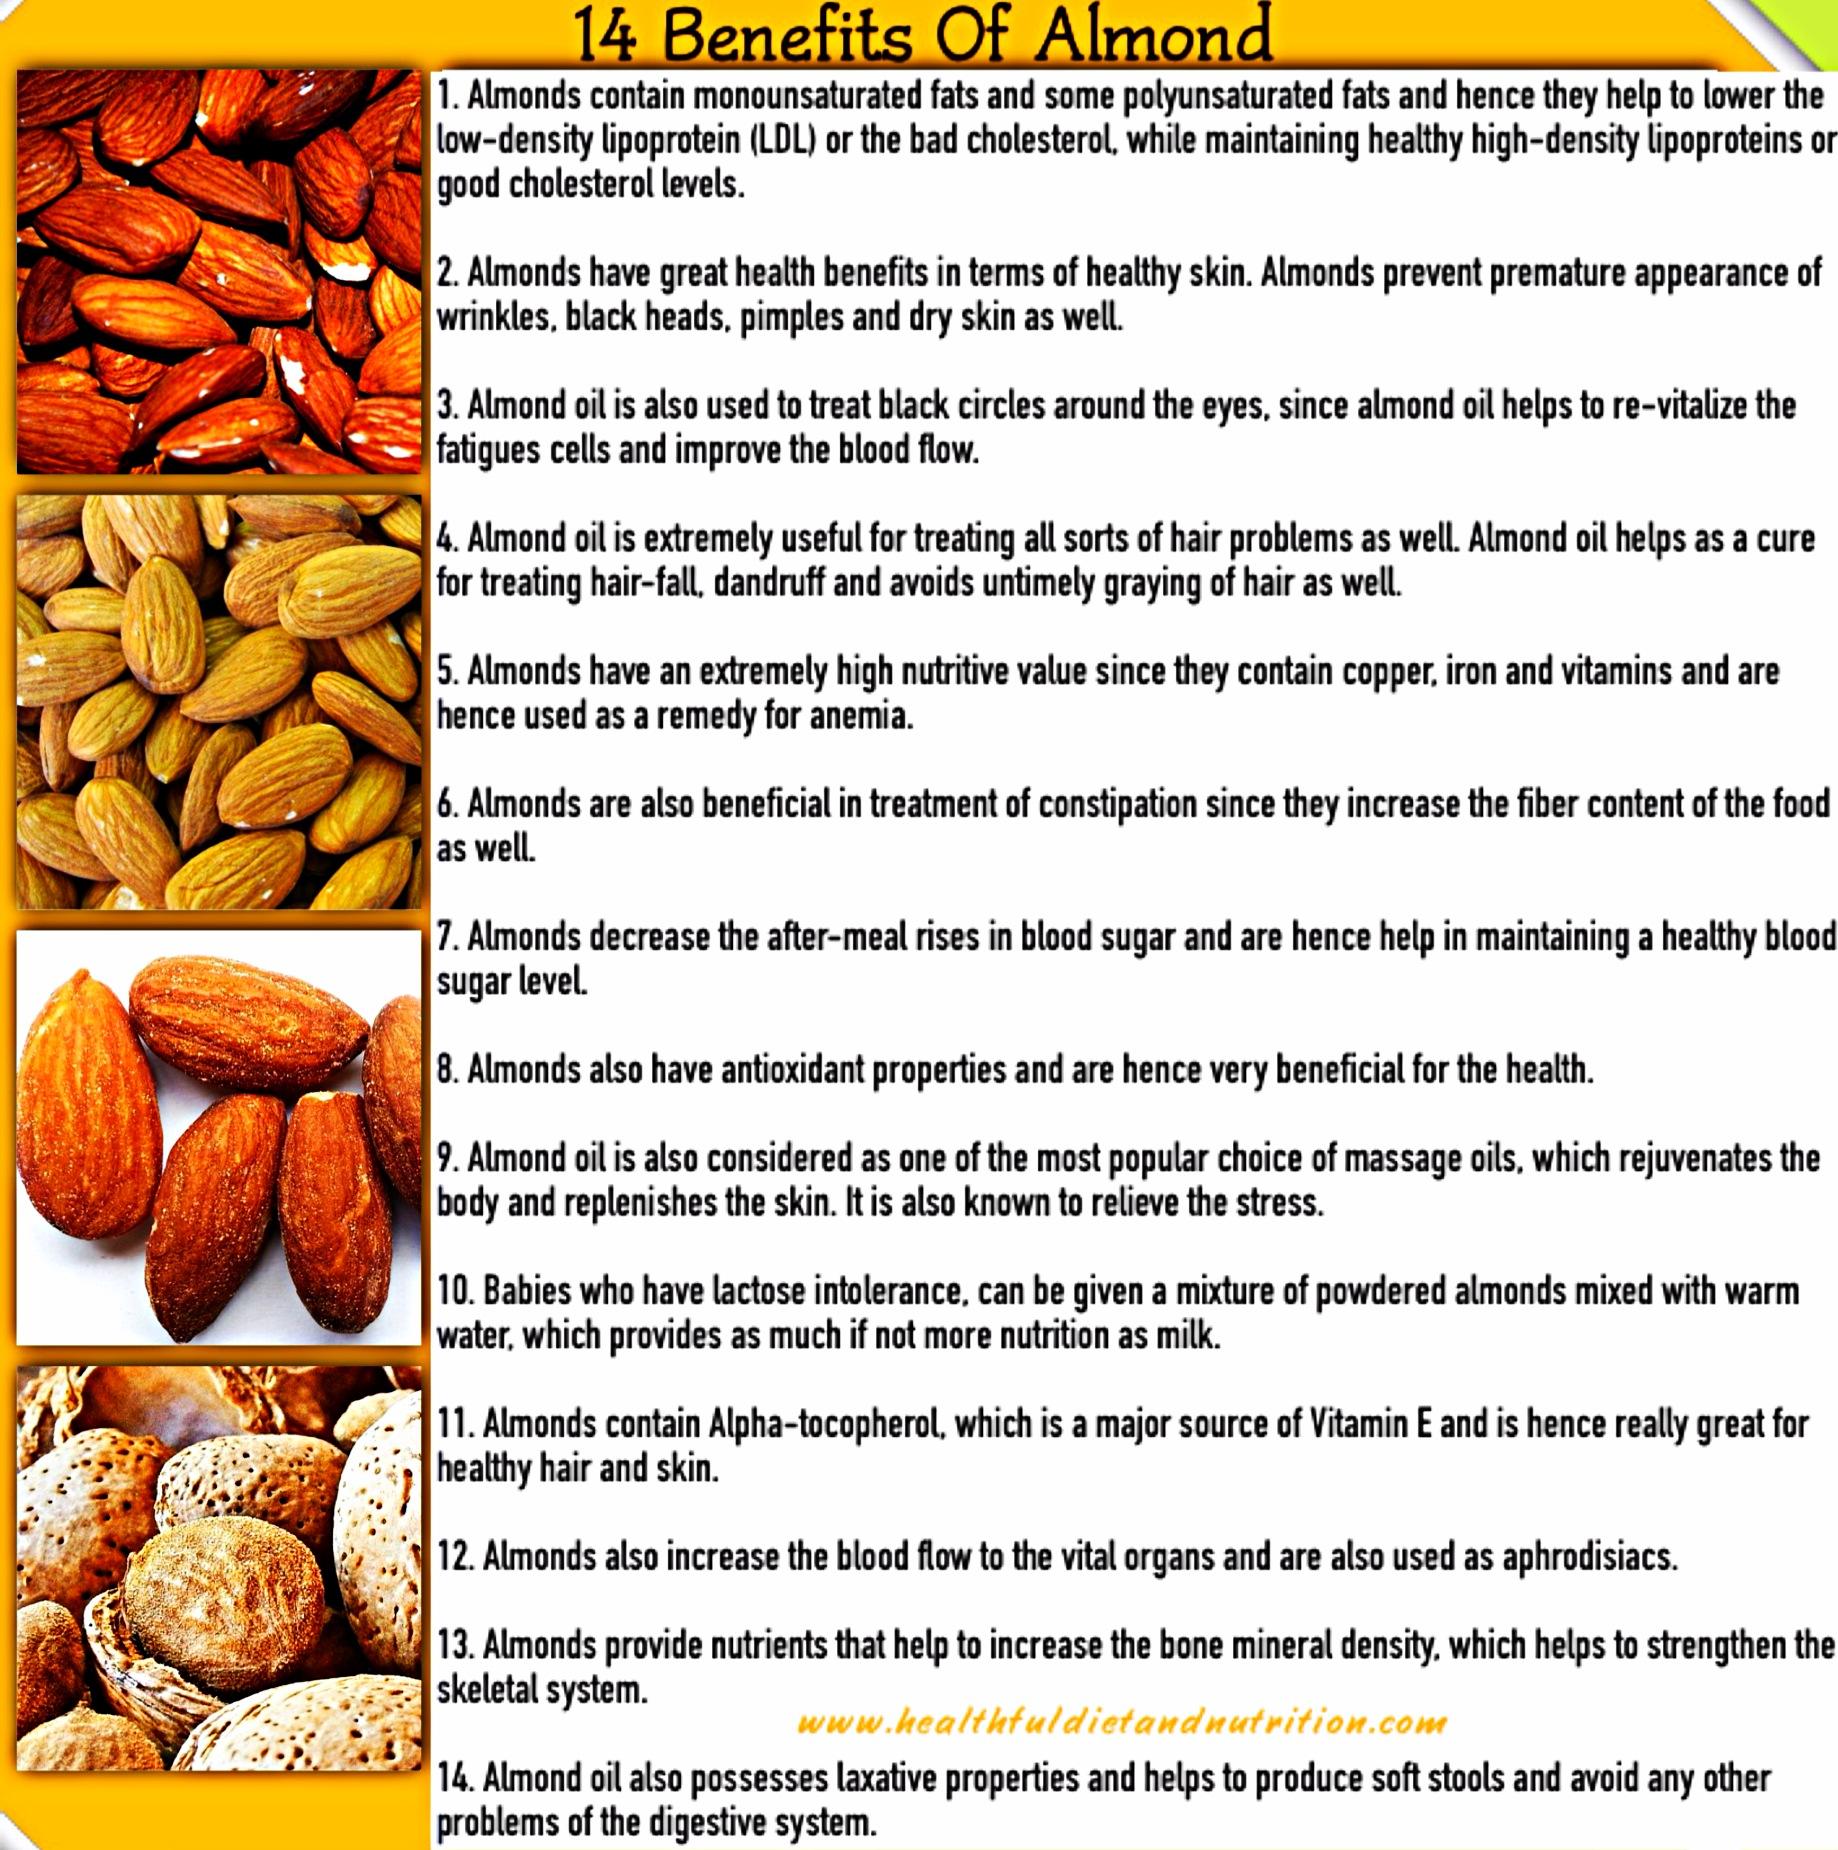 14 Benefits of Almond